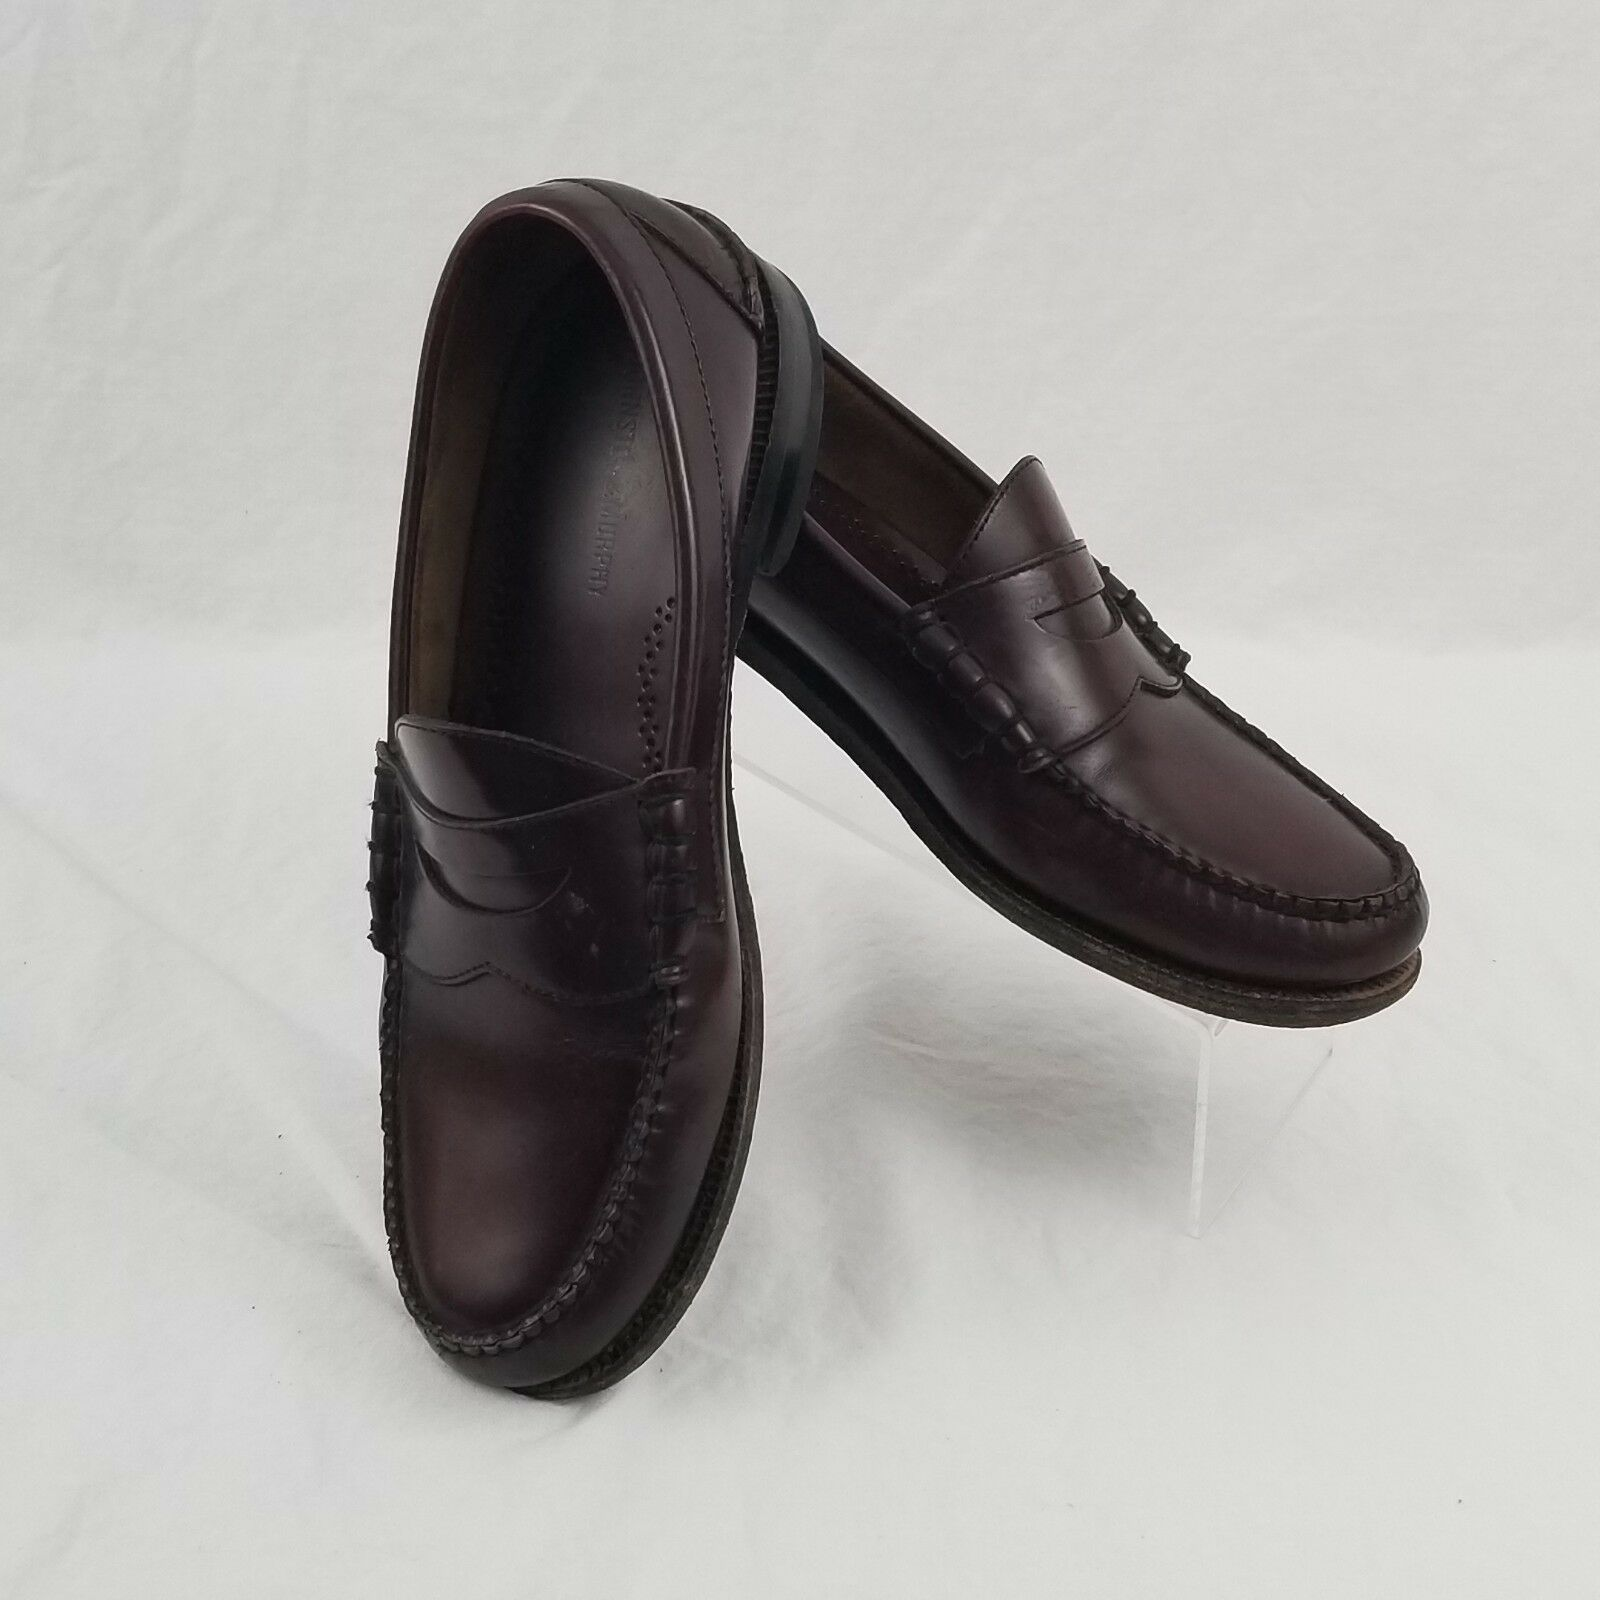 Johnston Moc & Murphy Aristocraft Burgundy Leather Penny Loafers Moc Johnston Toe size 9 e8 ea6444